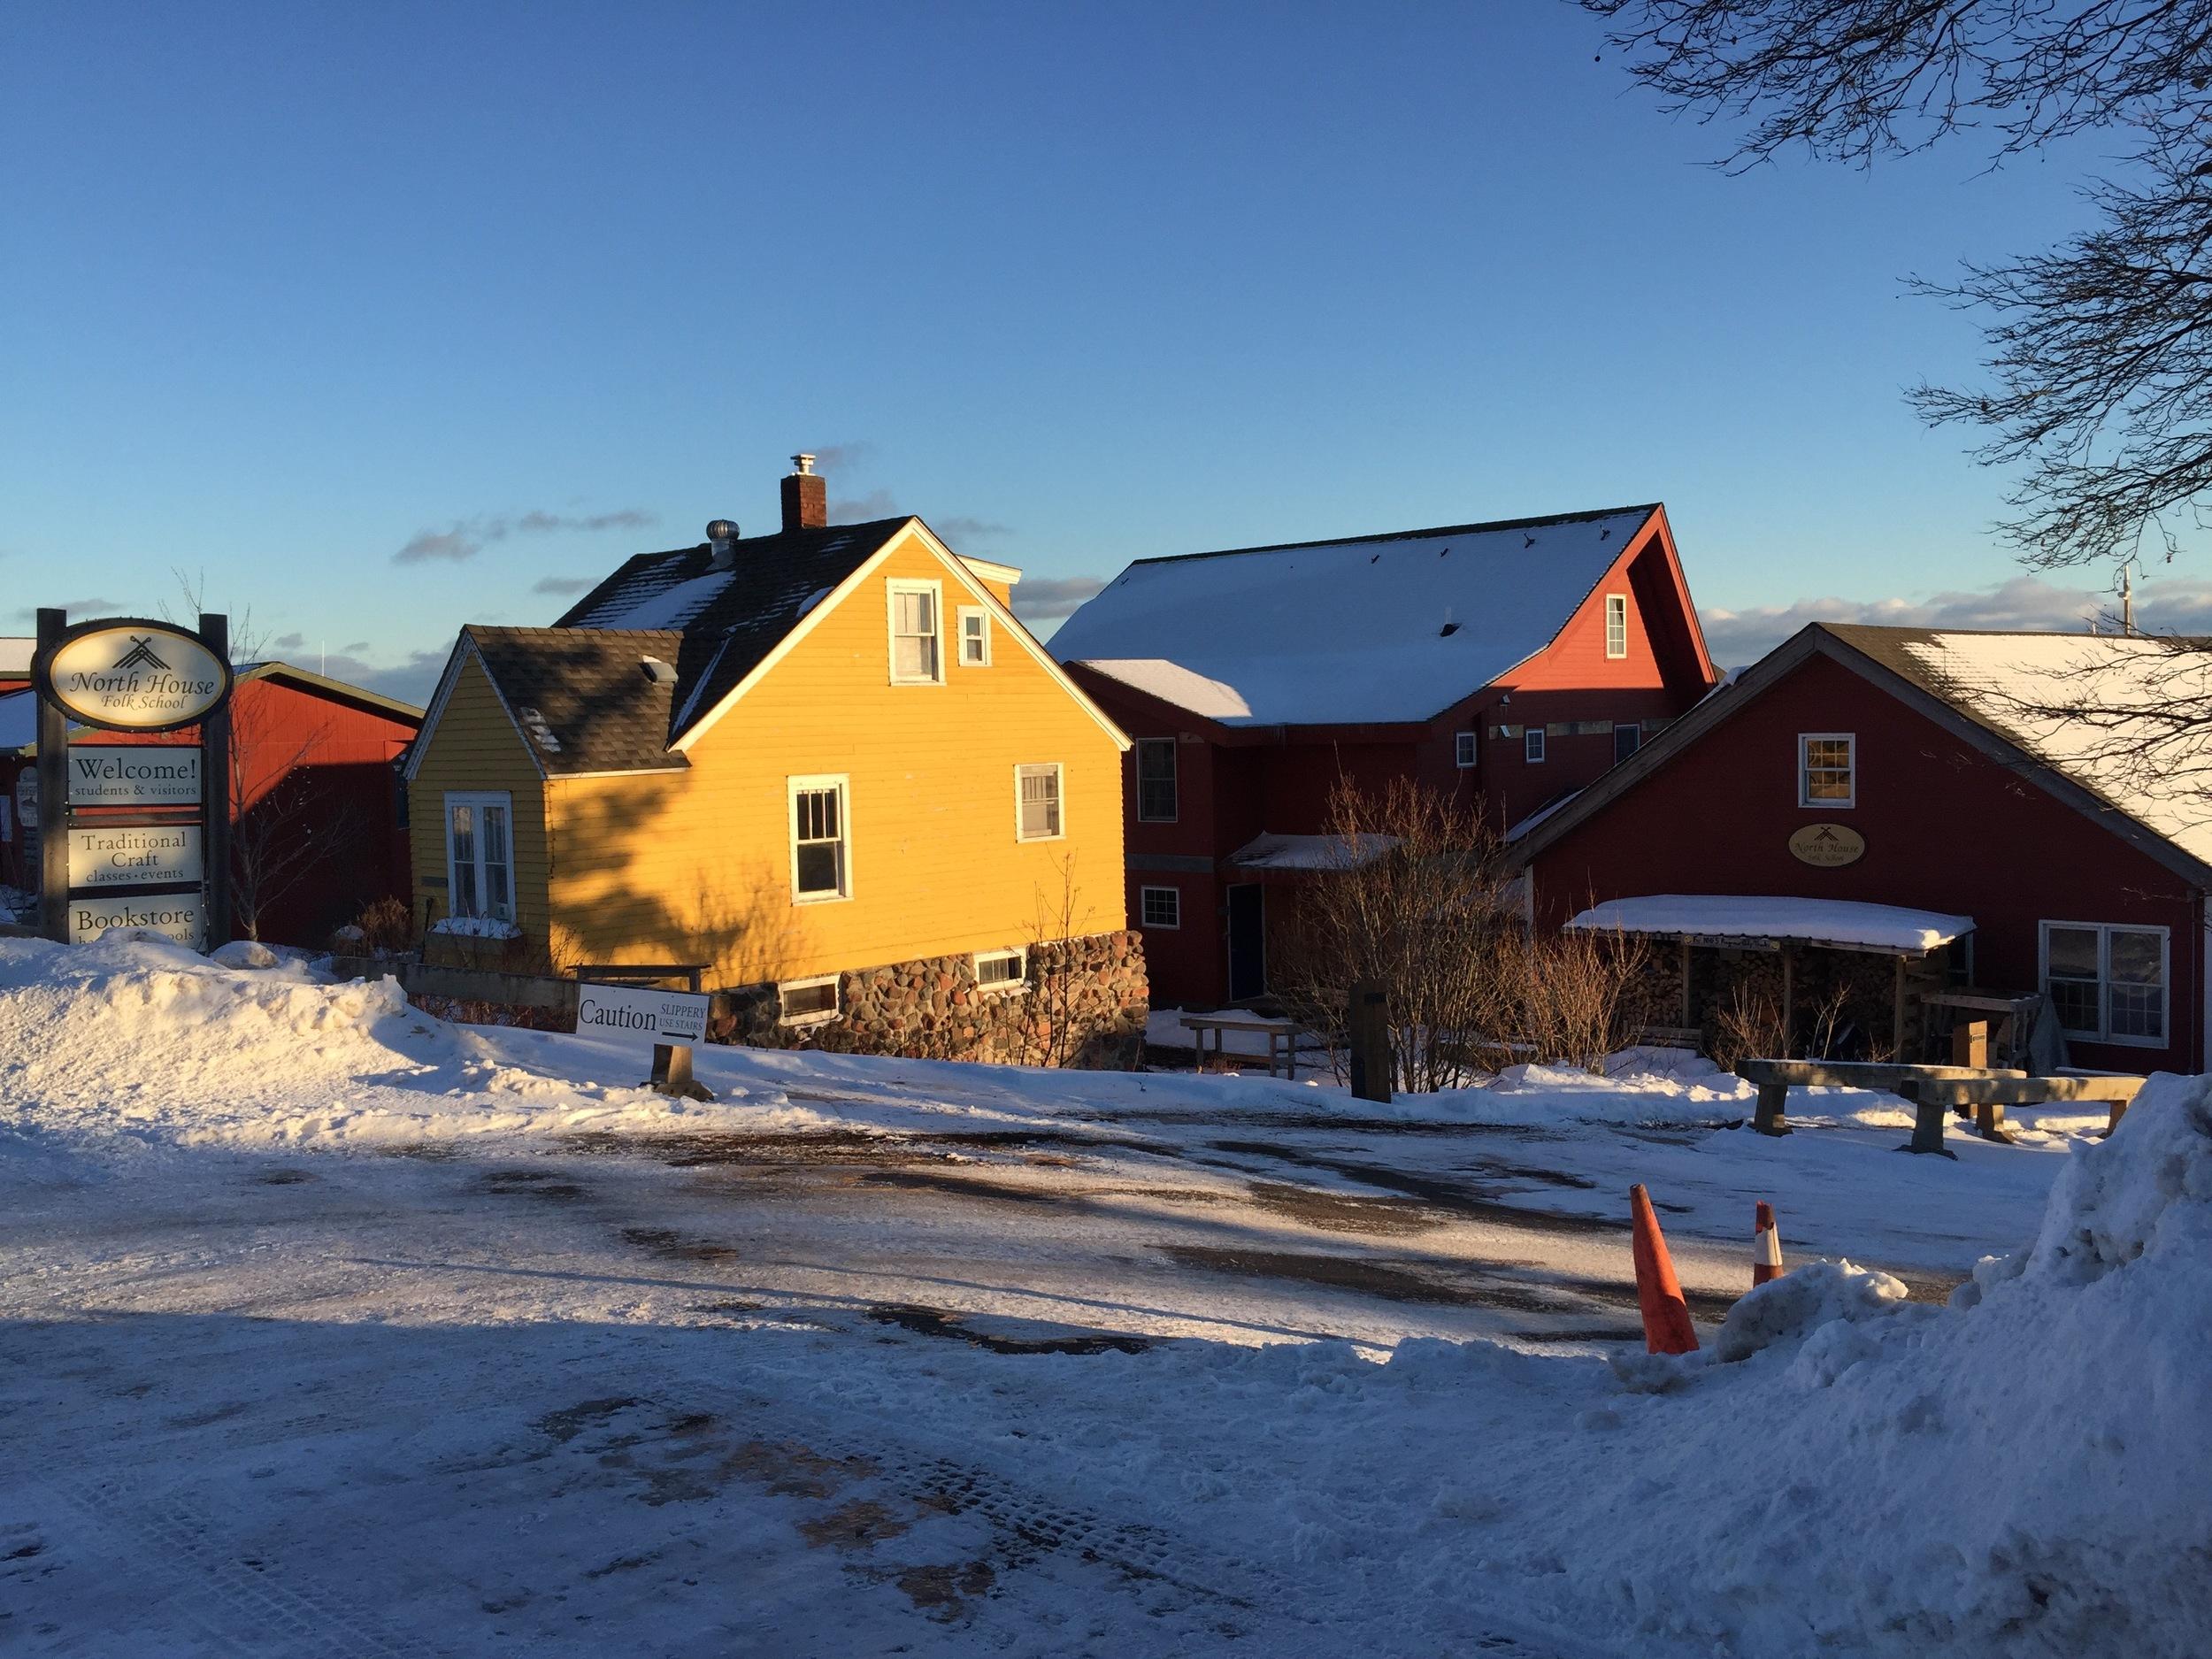 The North House Folk School sign and campus at Grand Marais, Minnesota.